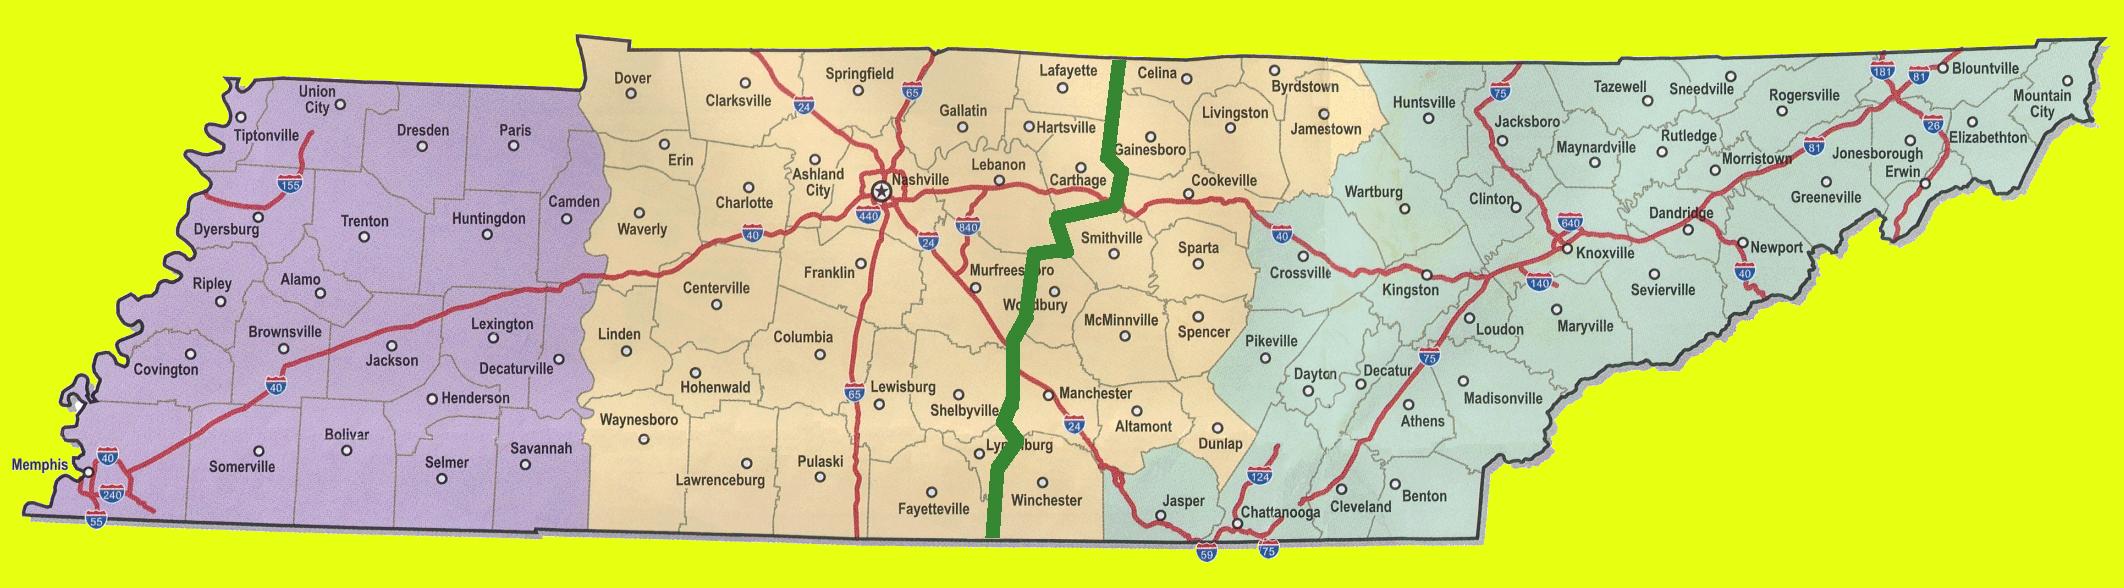 Coalition territories in TN